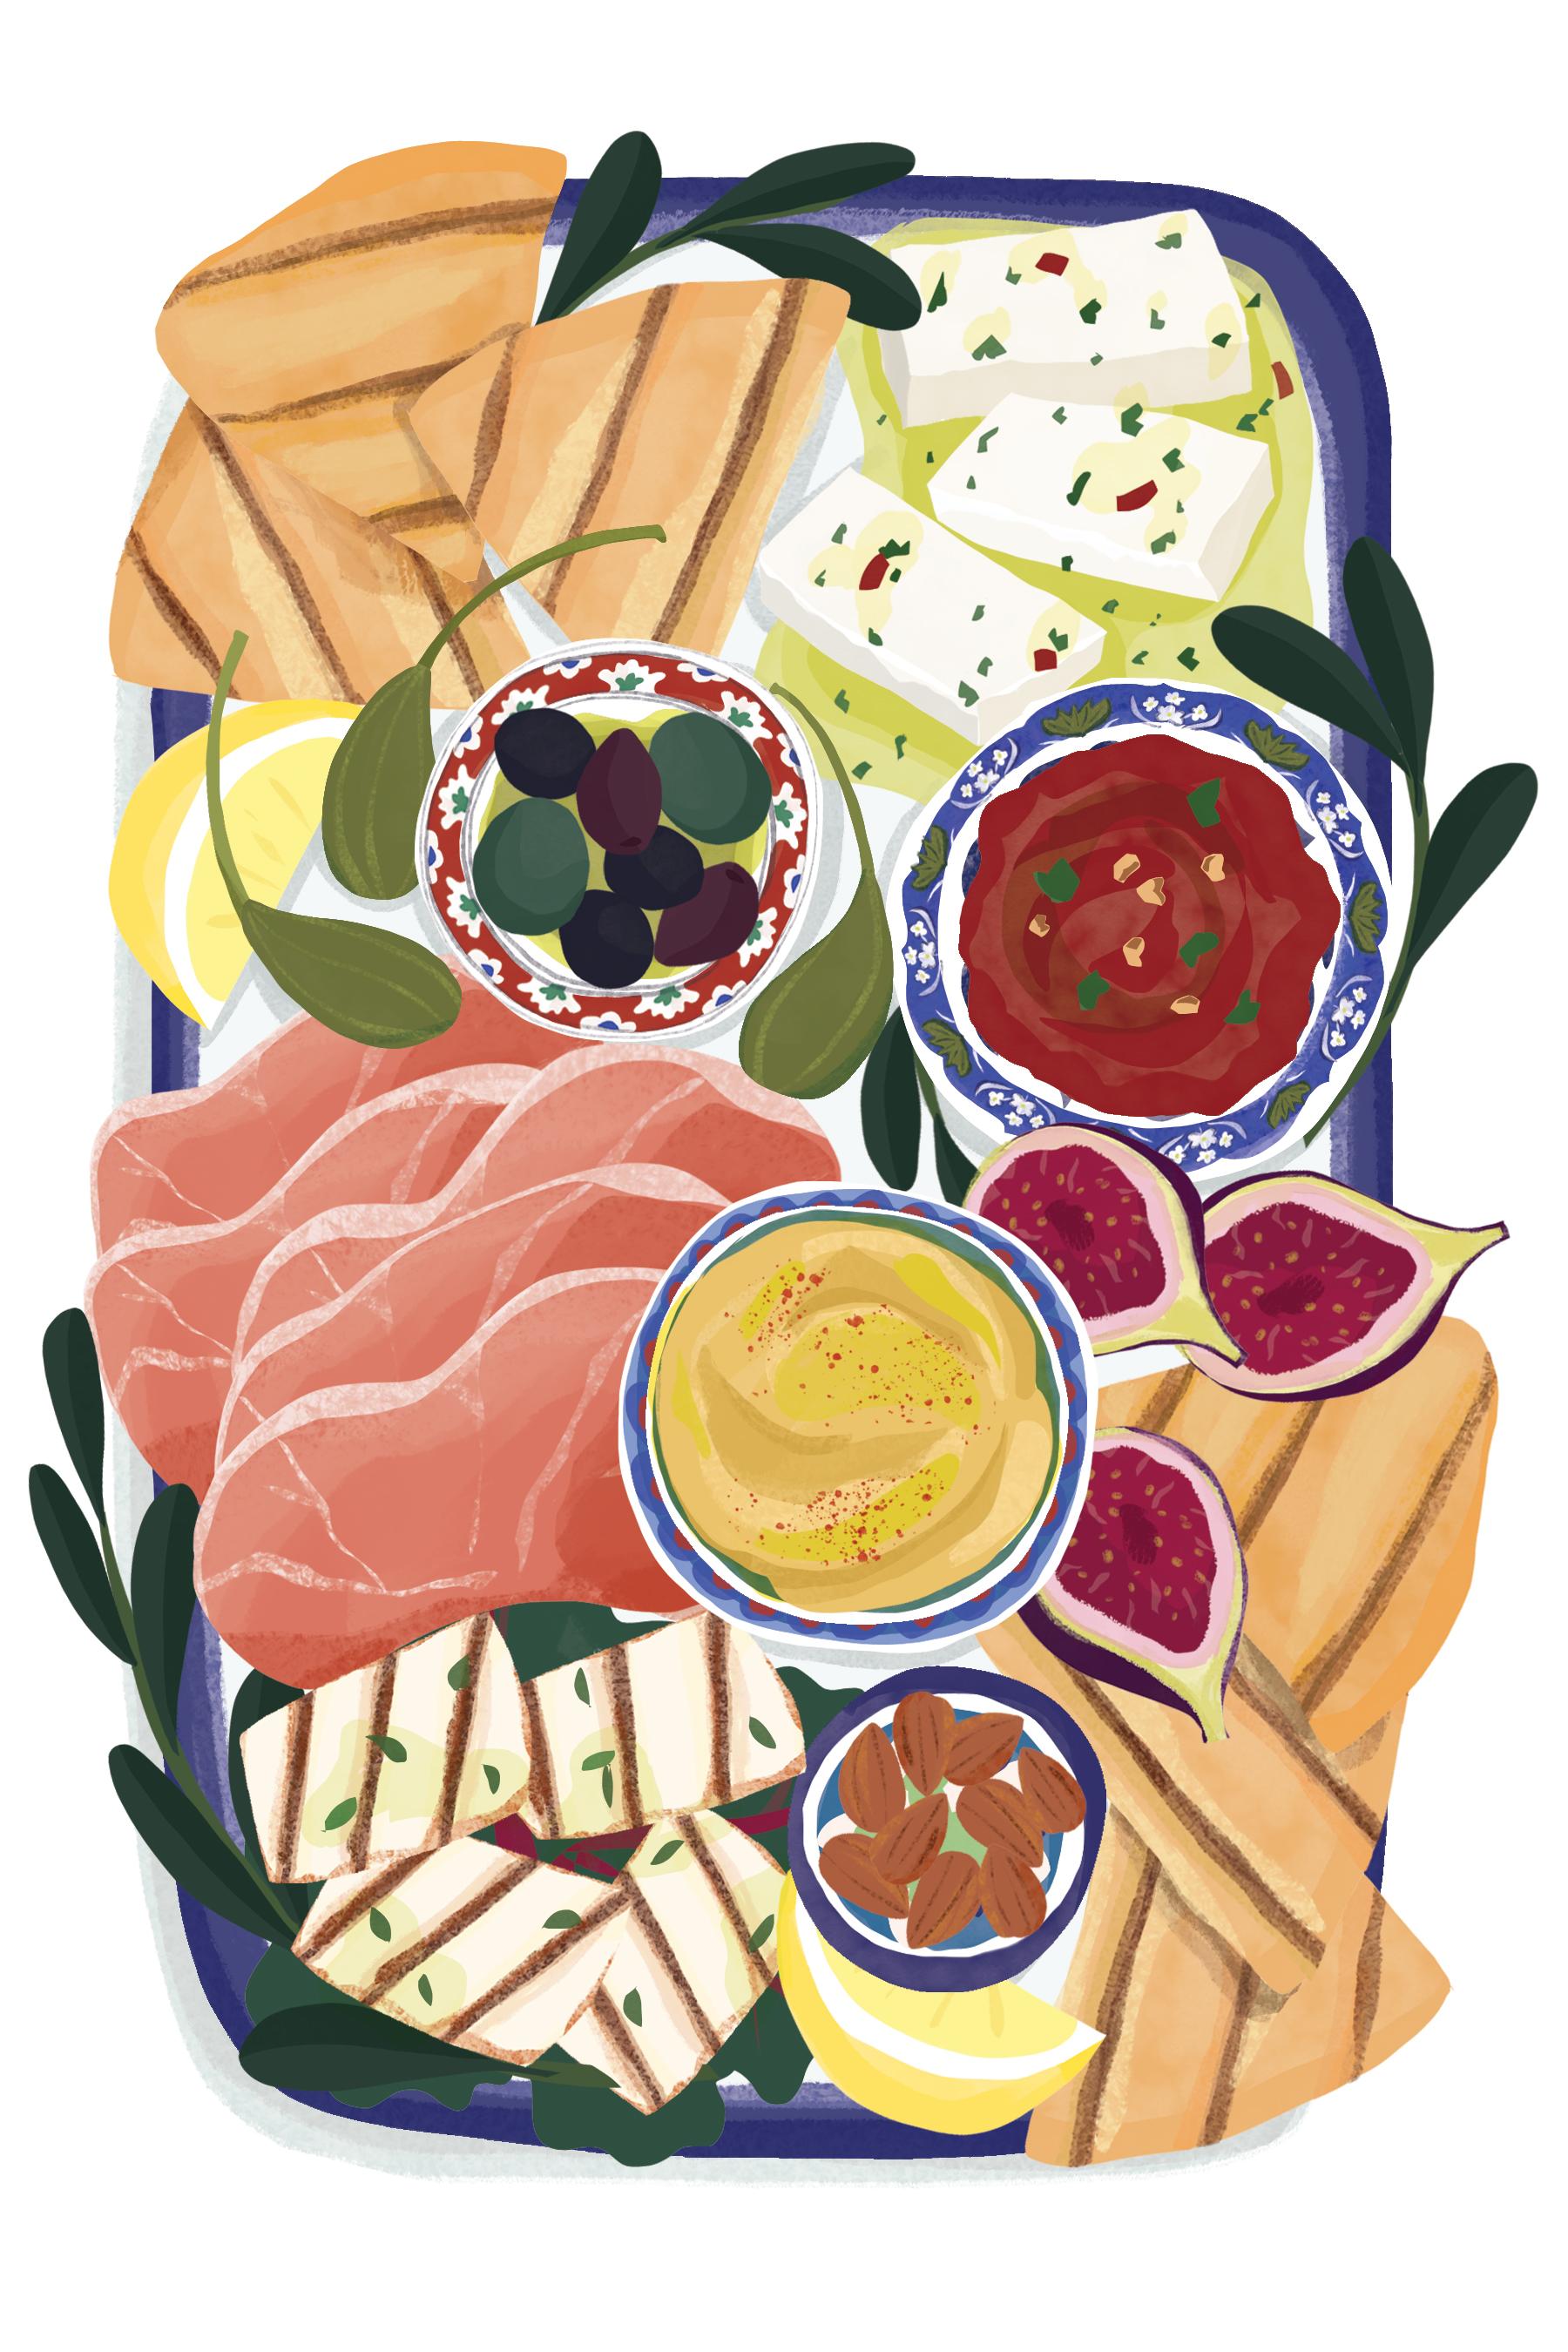 Mezze board Flo Leung illustration.jpg